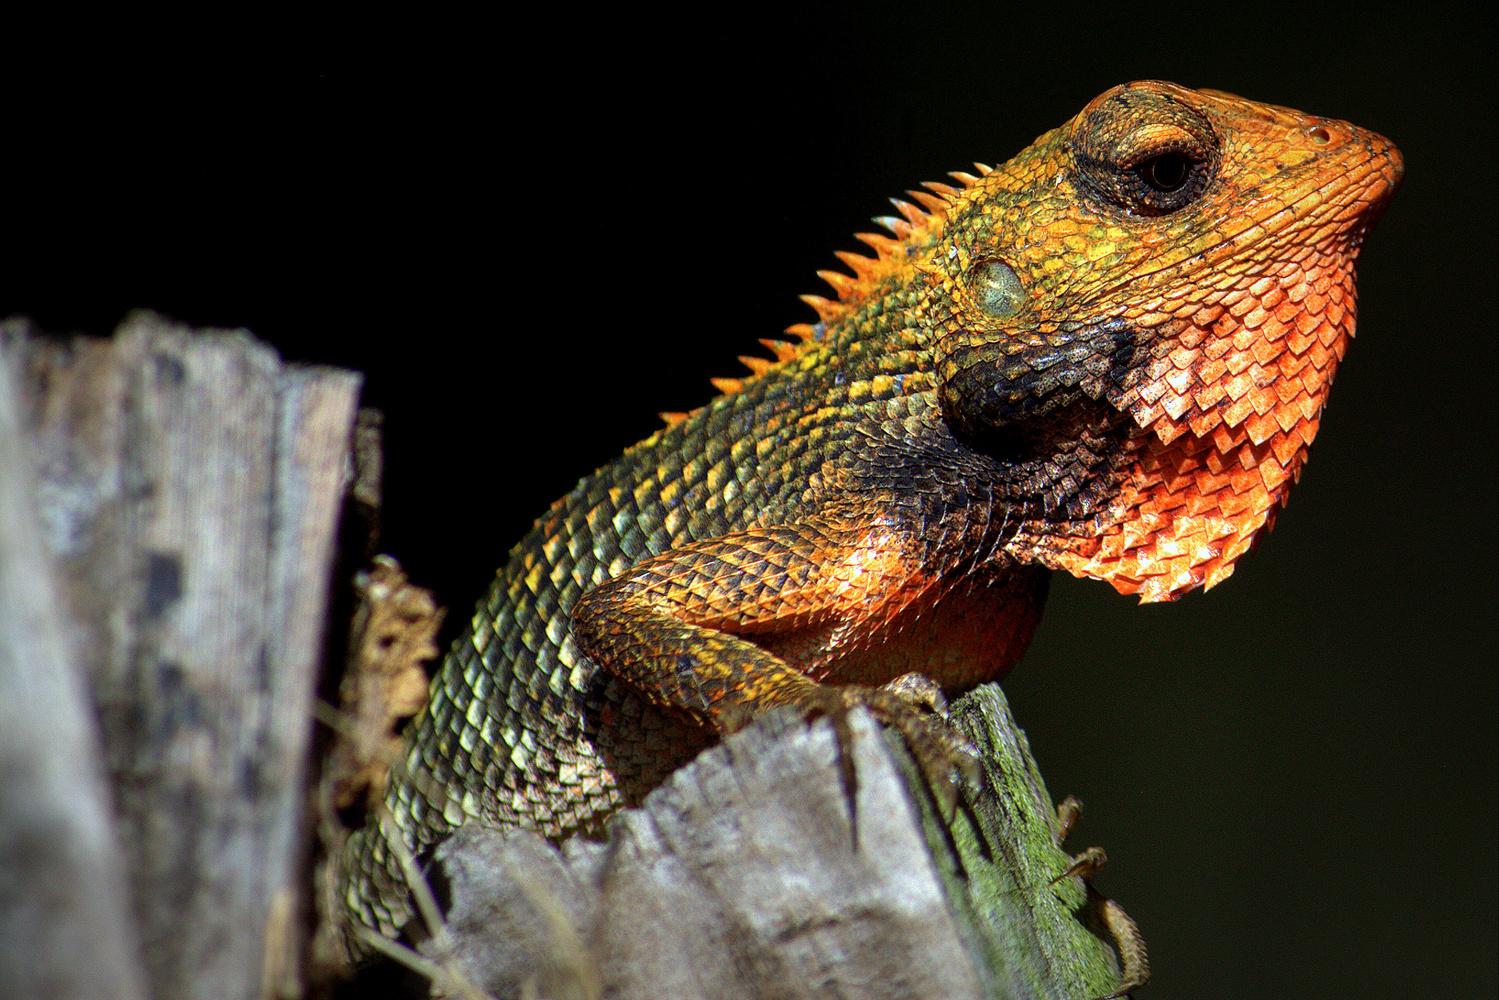 Orange Lizard by Shaun Botha